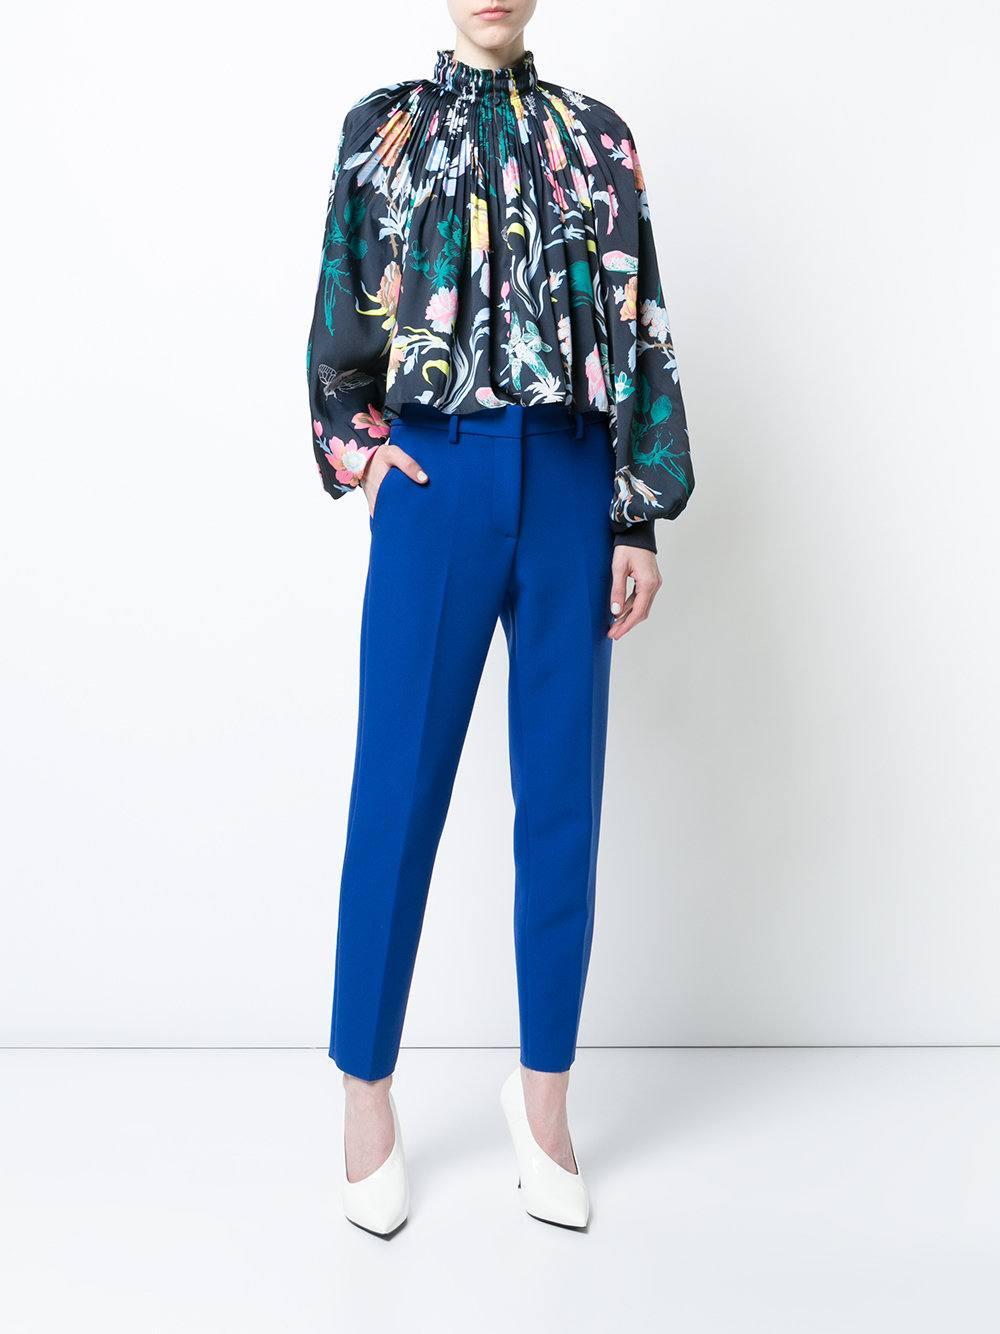 abeb69bb5b9 Жми! Модные блузки из шифона 2019-2020 года тенденции 70 фото